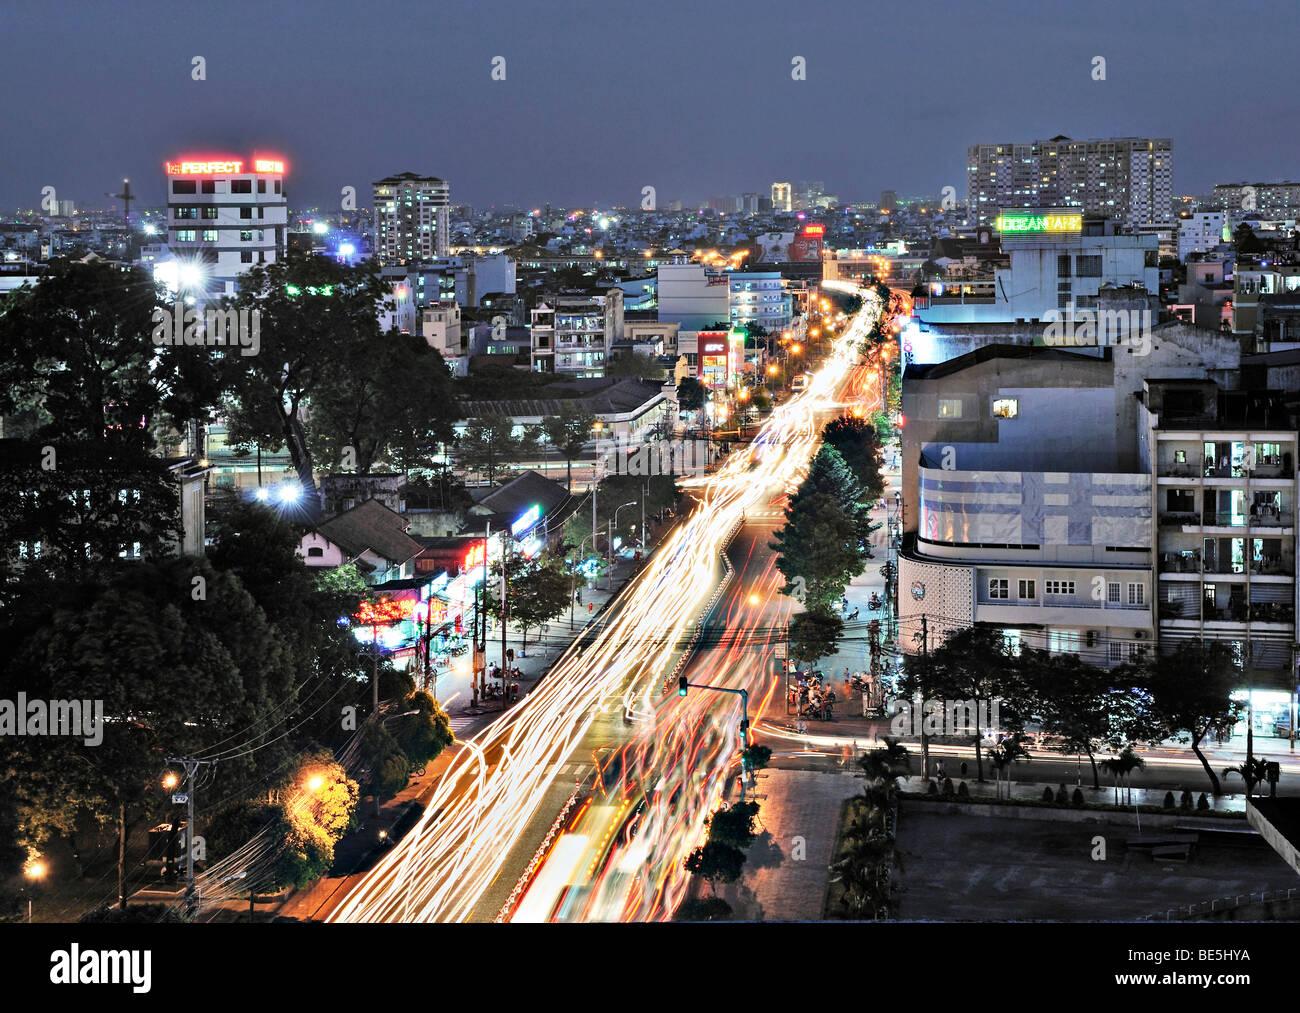 Busy road, arterial road at night, Ho Chi Minh City, Saigon, Vietnam, Asia - Stock Image